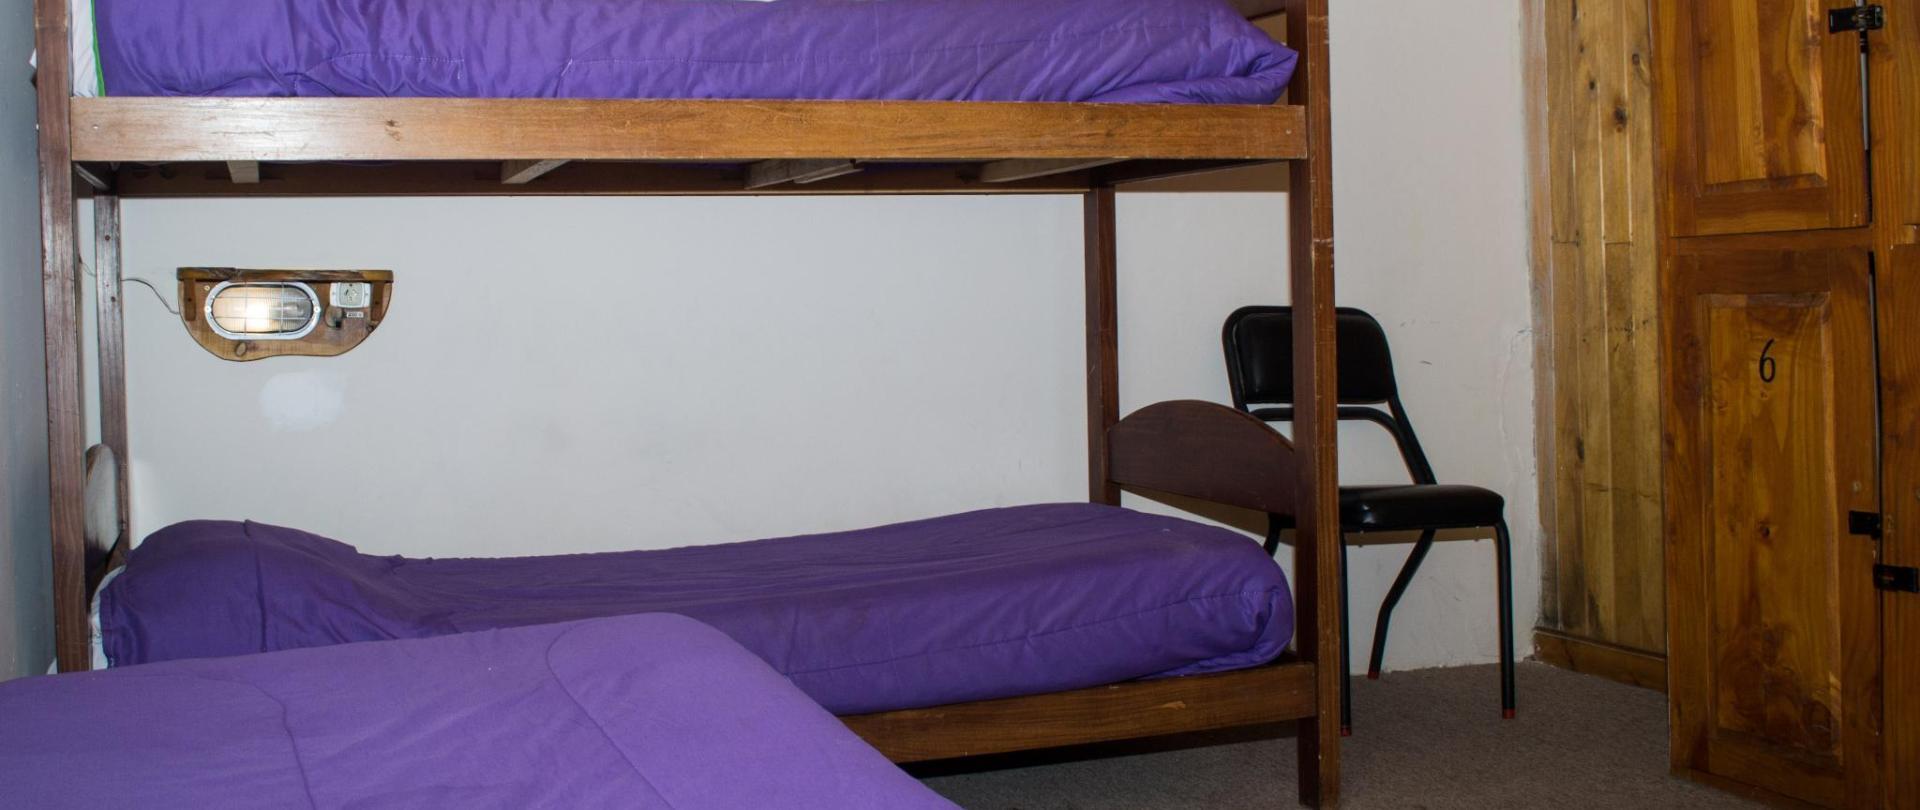 6 bed dorm_0041.jpg